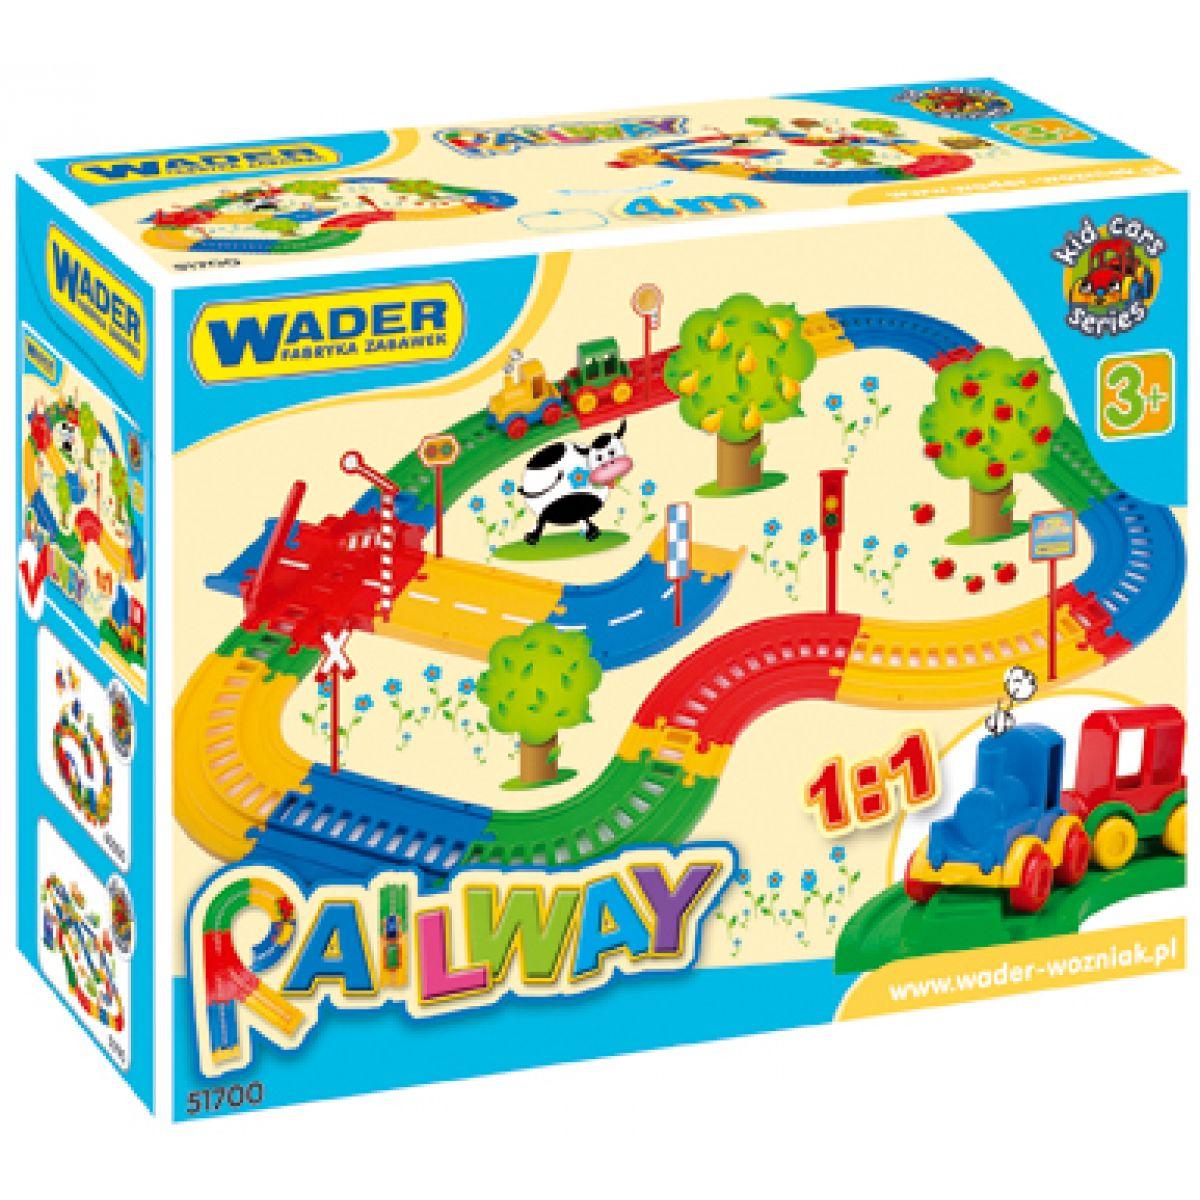 Železnice 4m Wader 51700